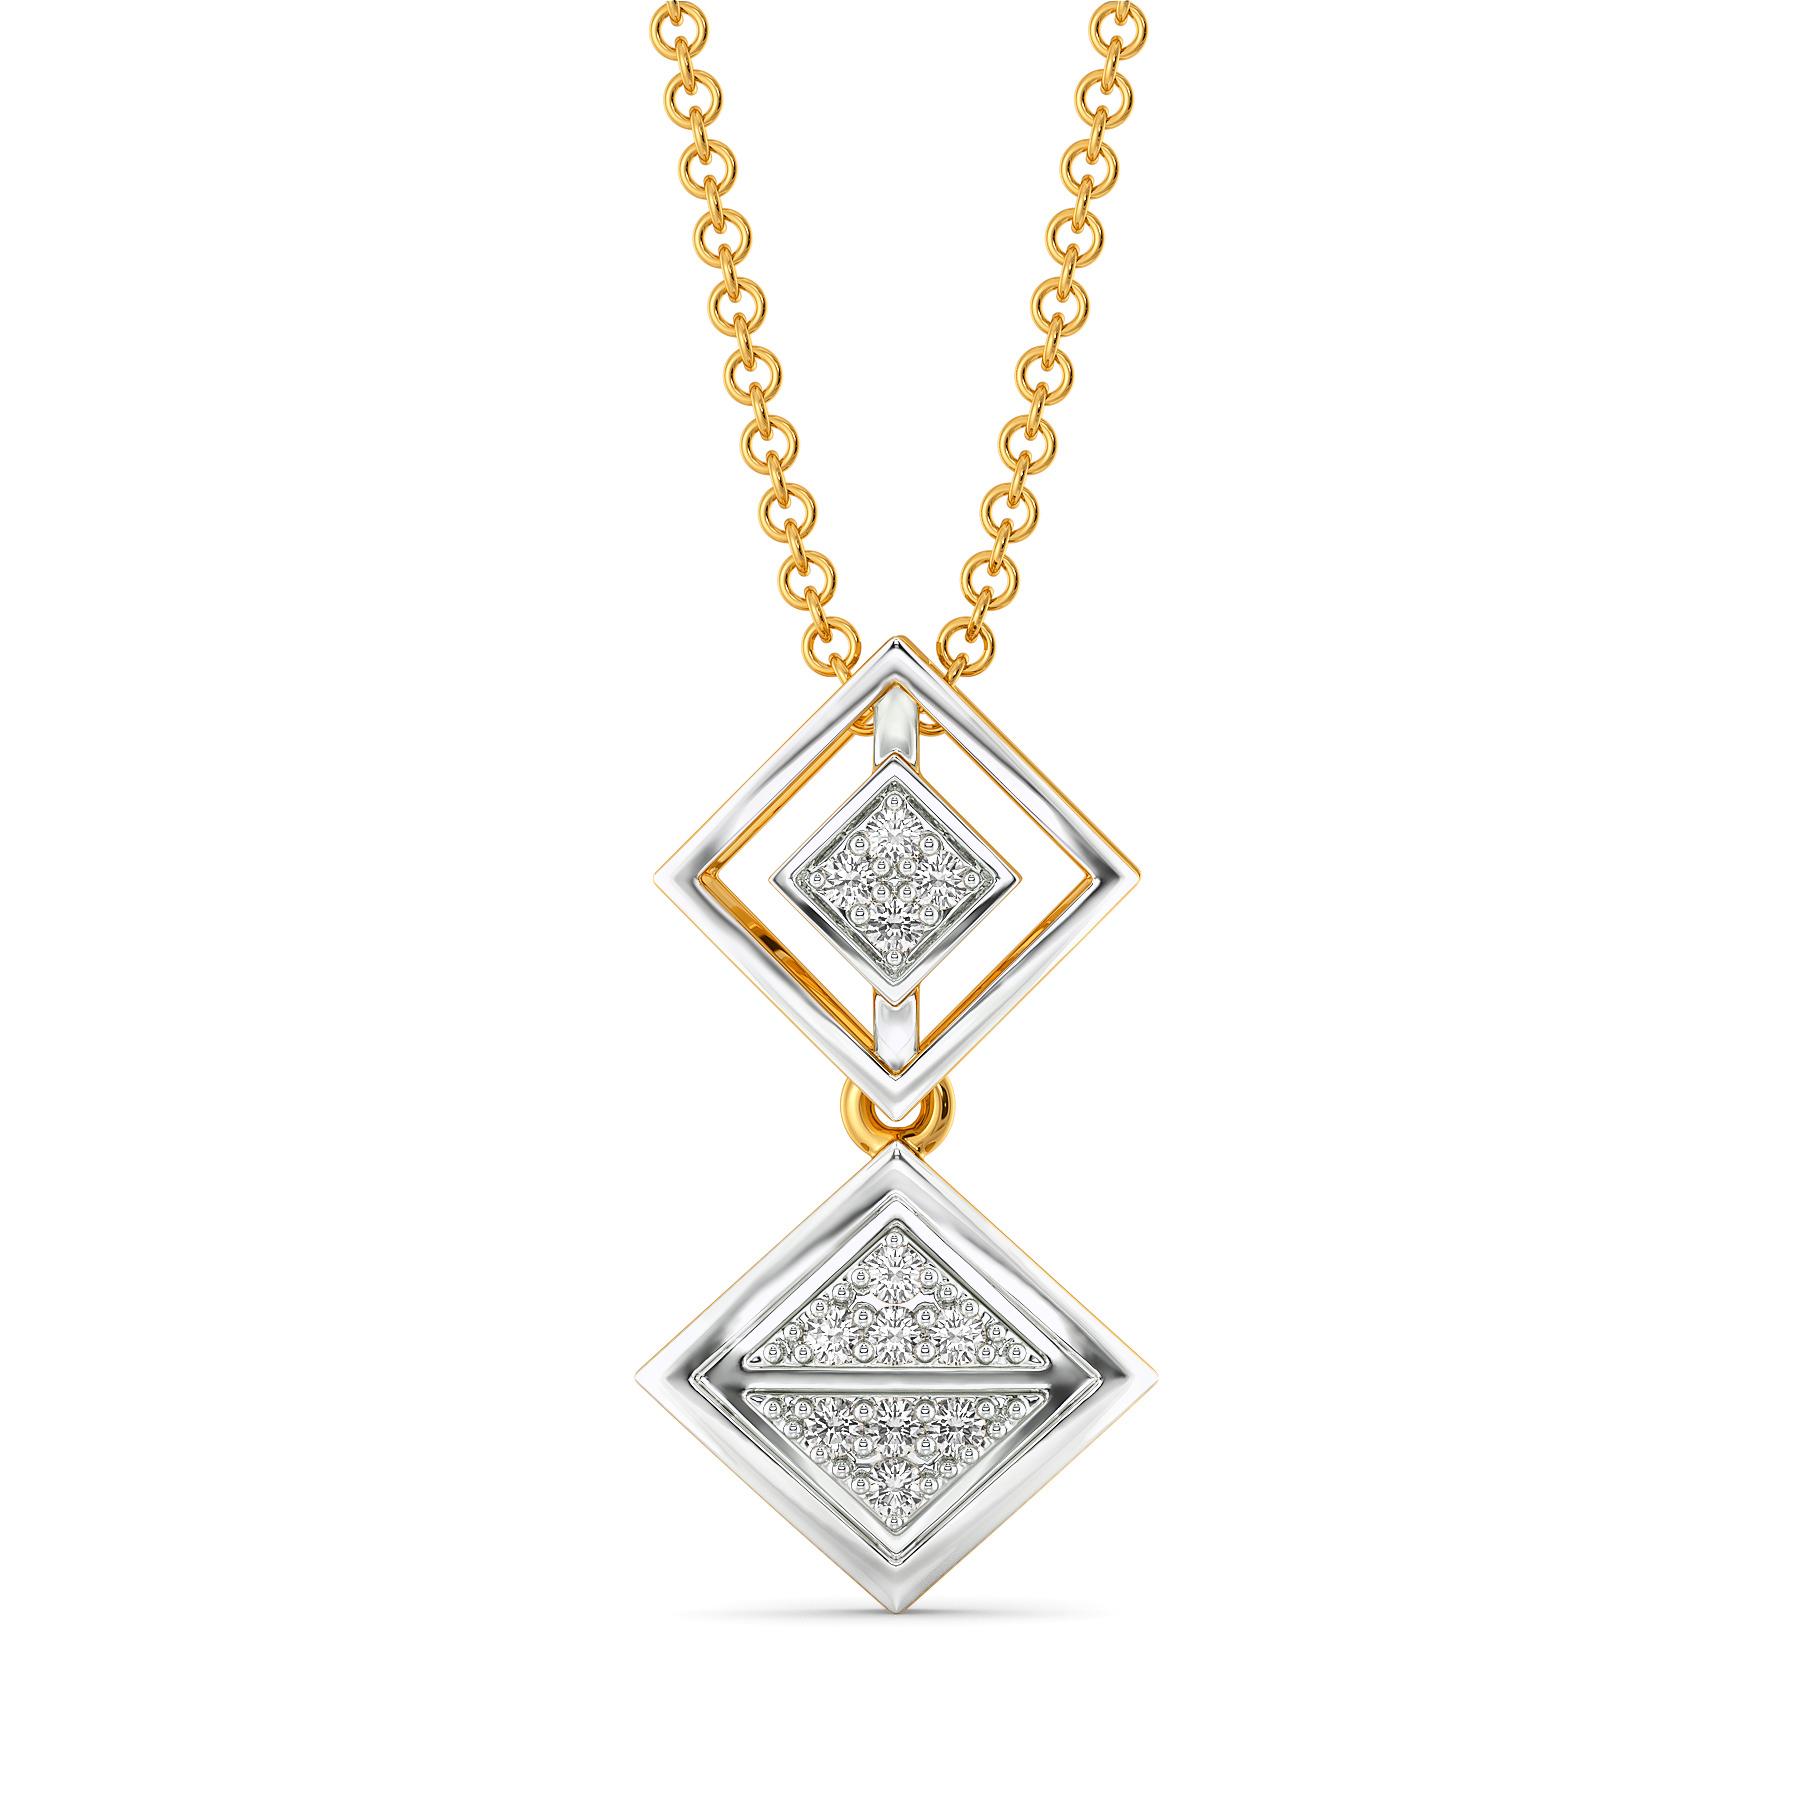 Strap Staple Diamond Pendants